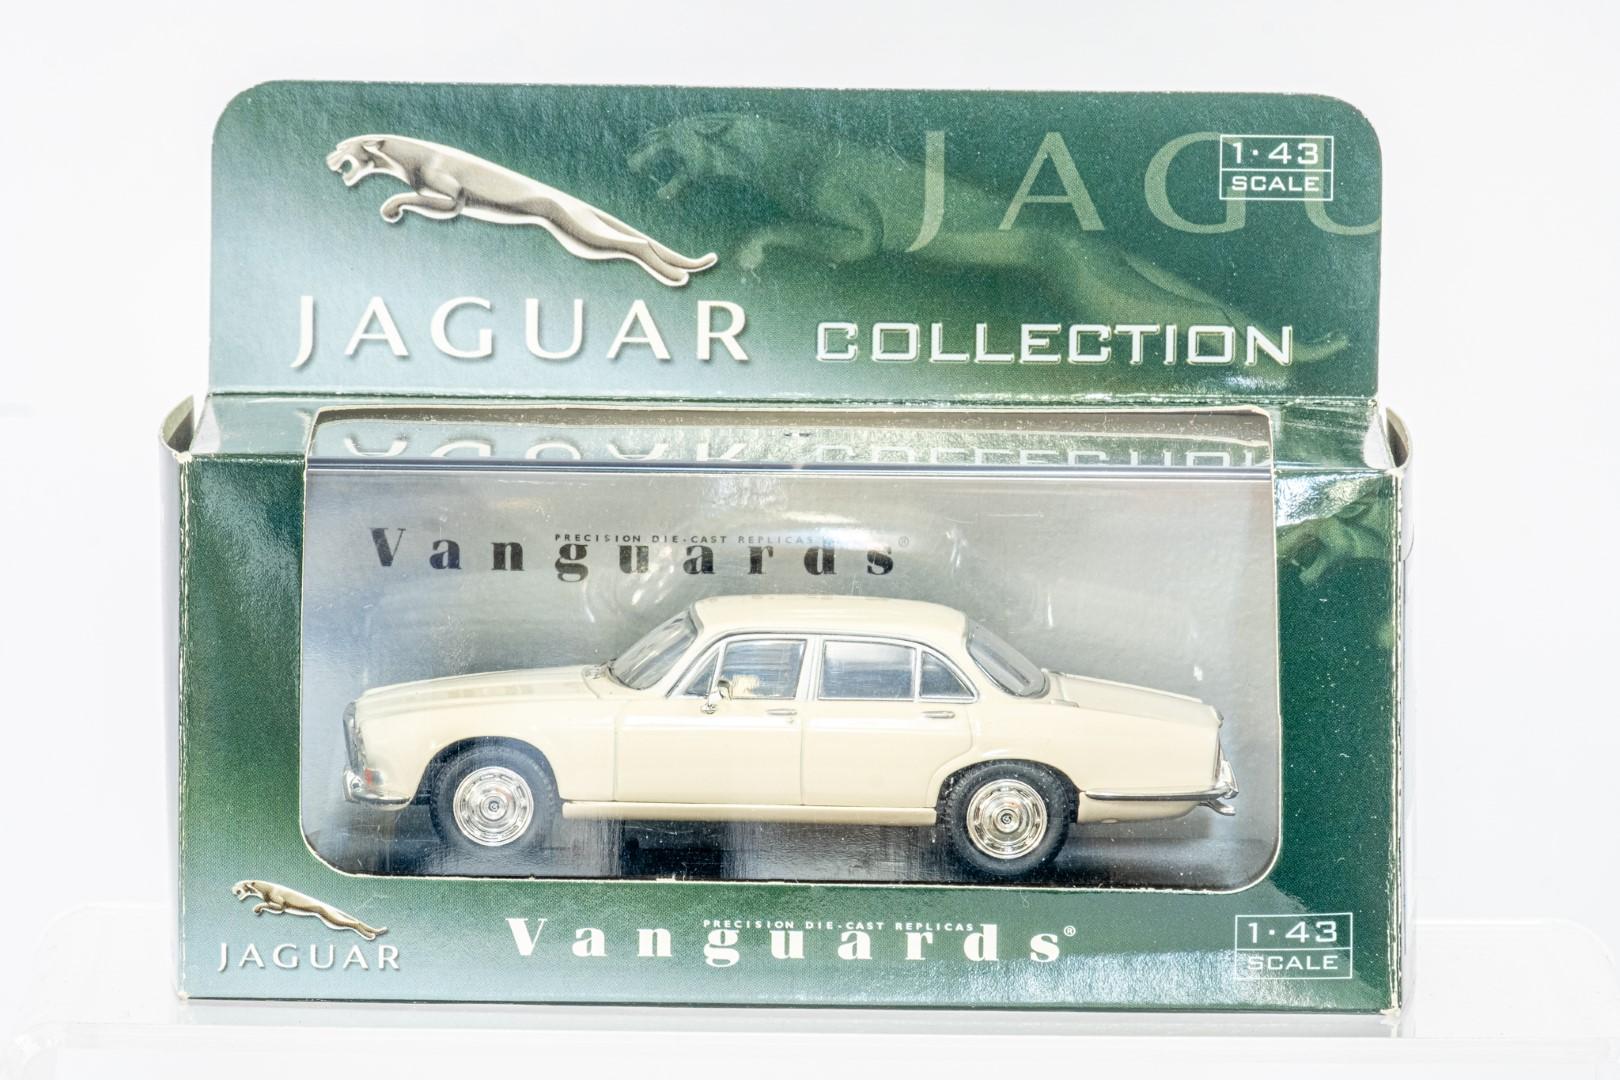 Vanguards Austin 1800 - Dragon's Taxis / Daimler Sovereign - Old English White - Image 2 of 3